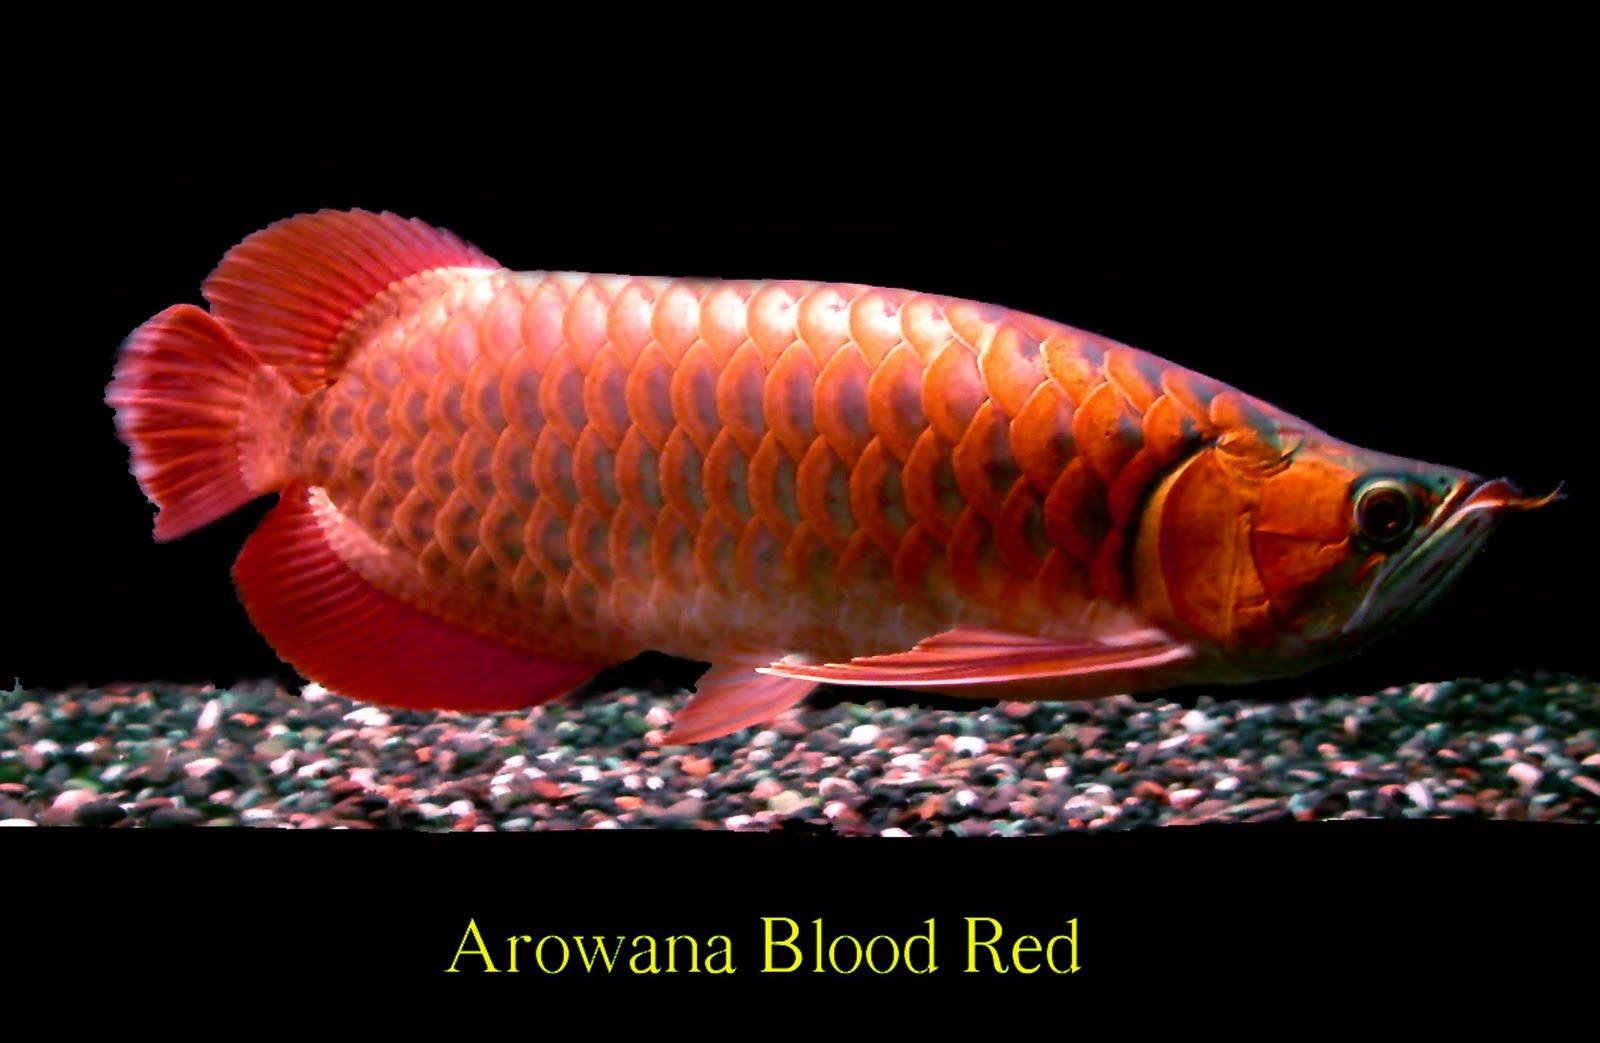 Arowana aquaculture: Arowana aquaculture